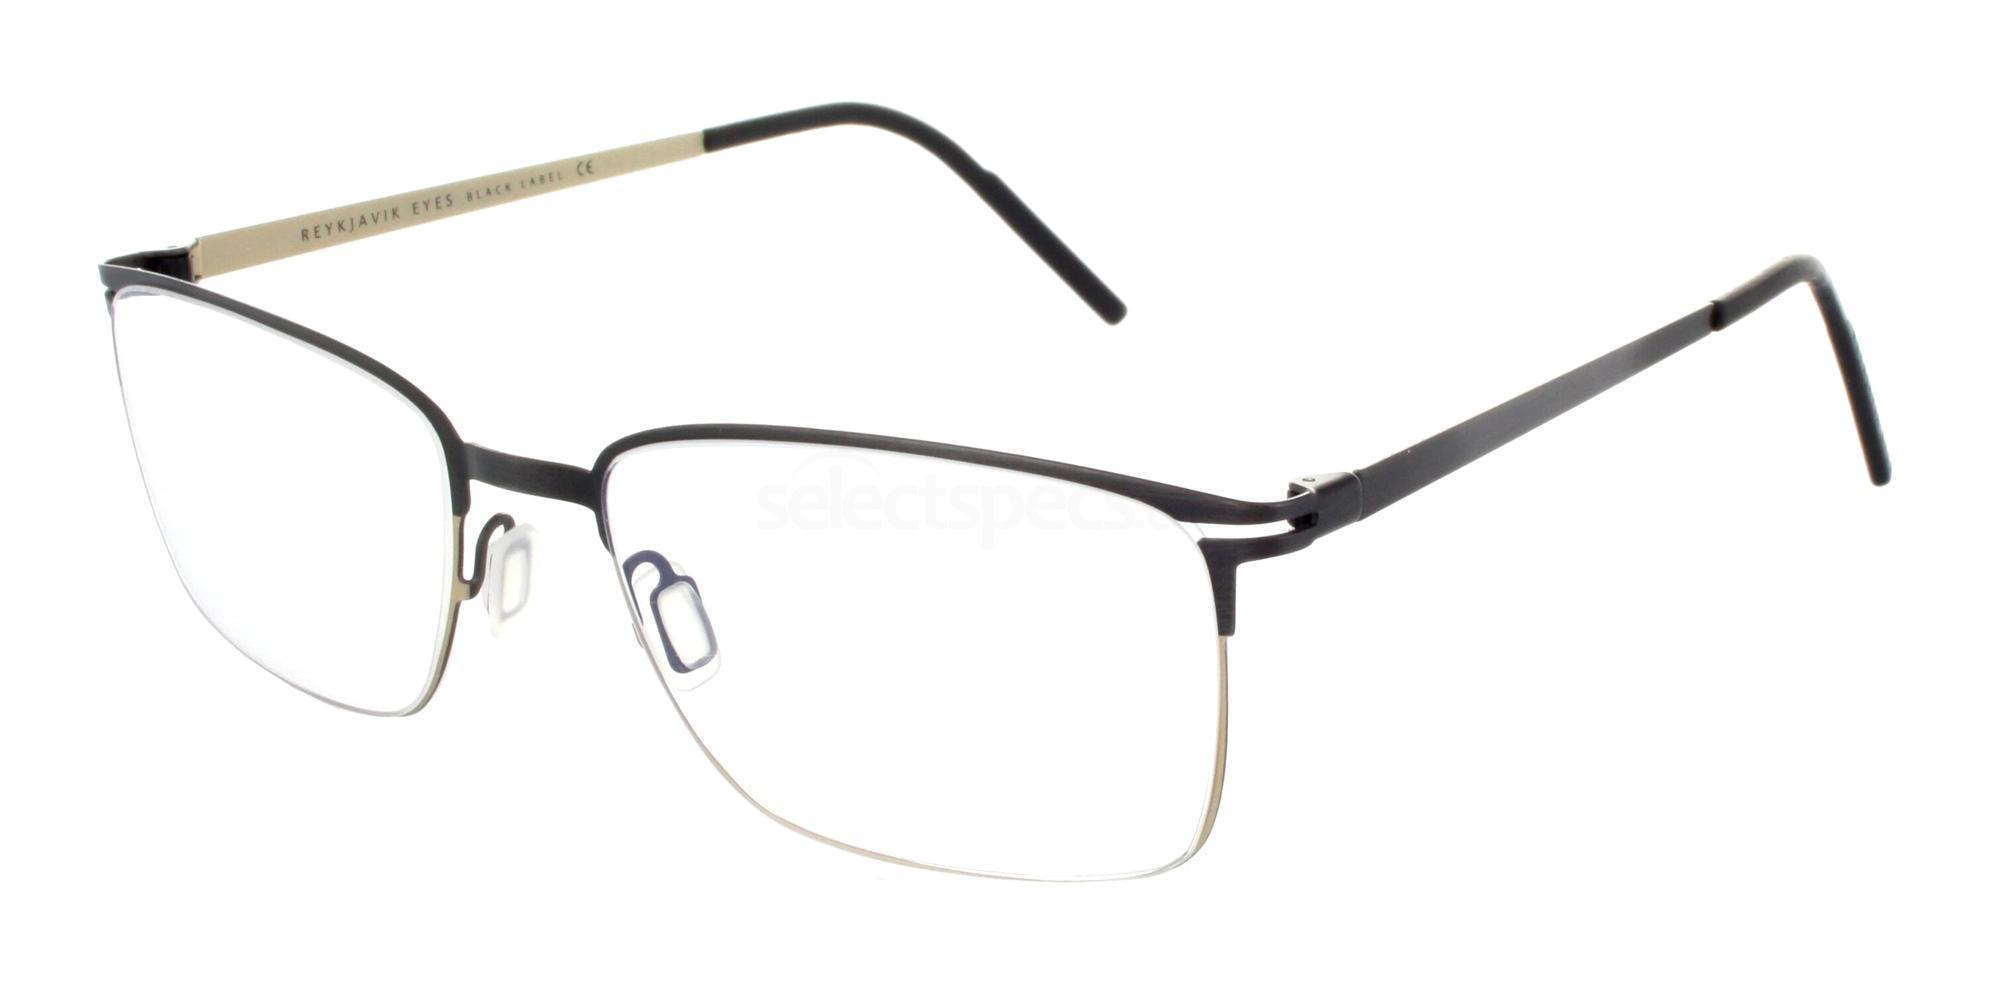 С1 HEIMDALL Glasses, Reykjavik Eyes Black Label